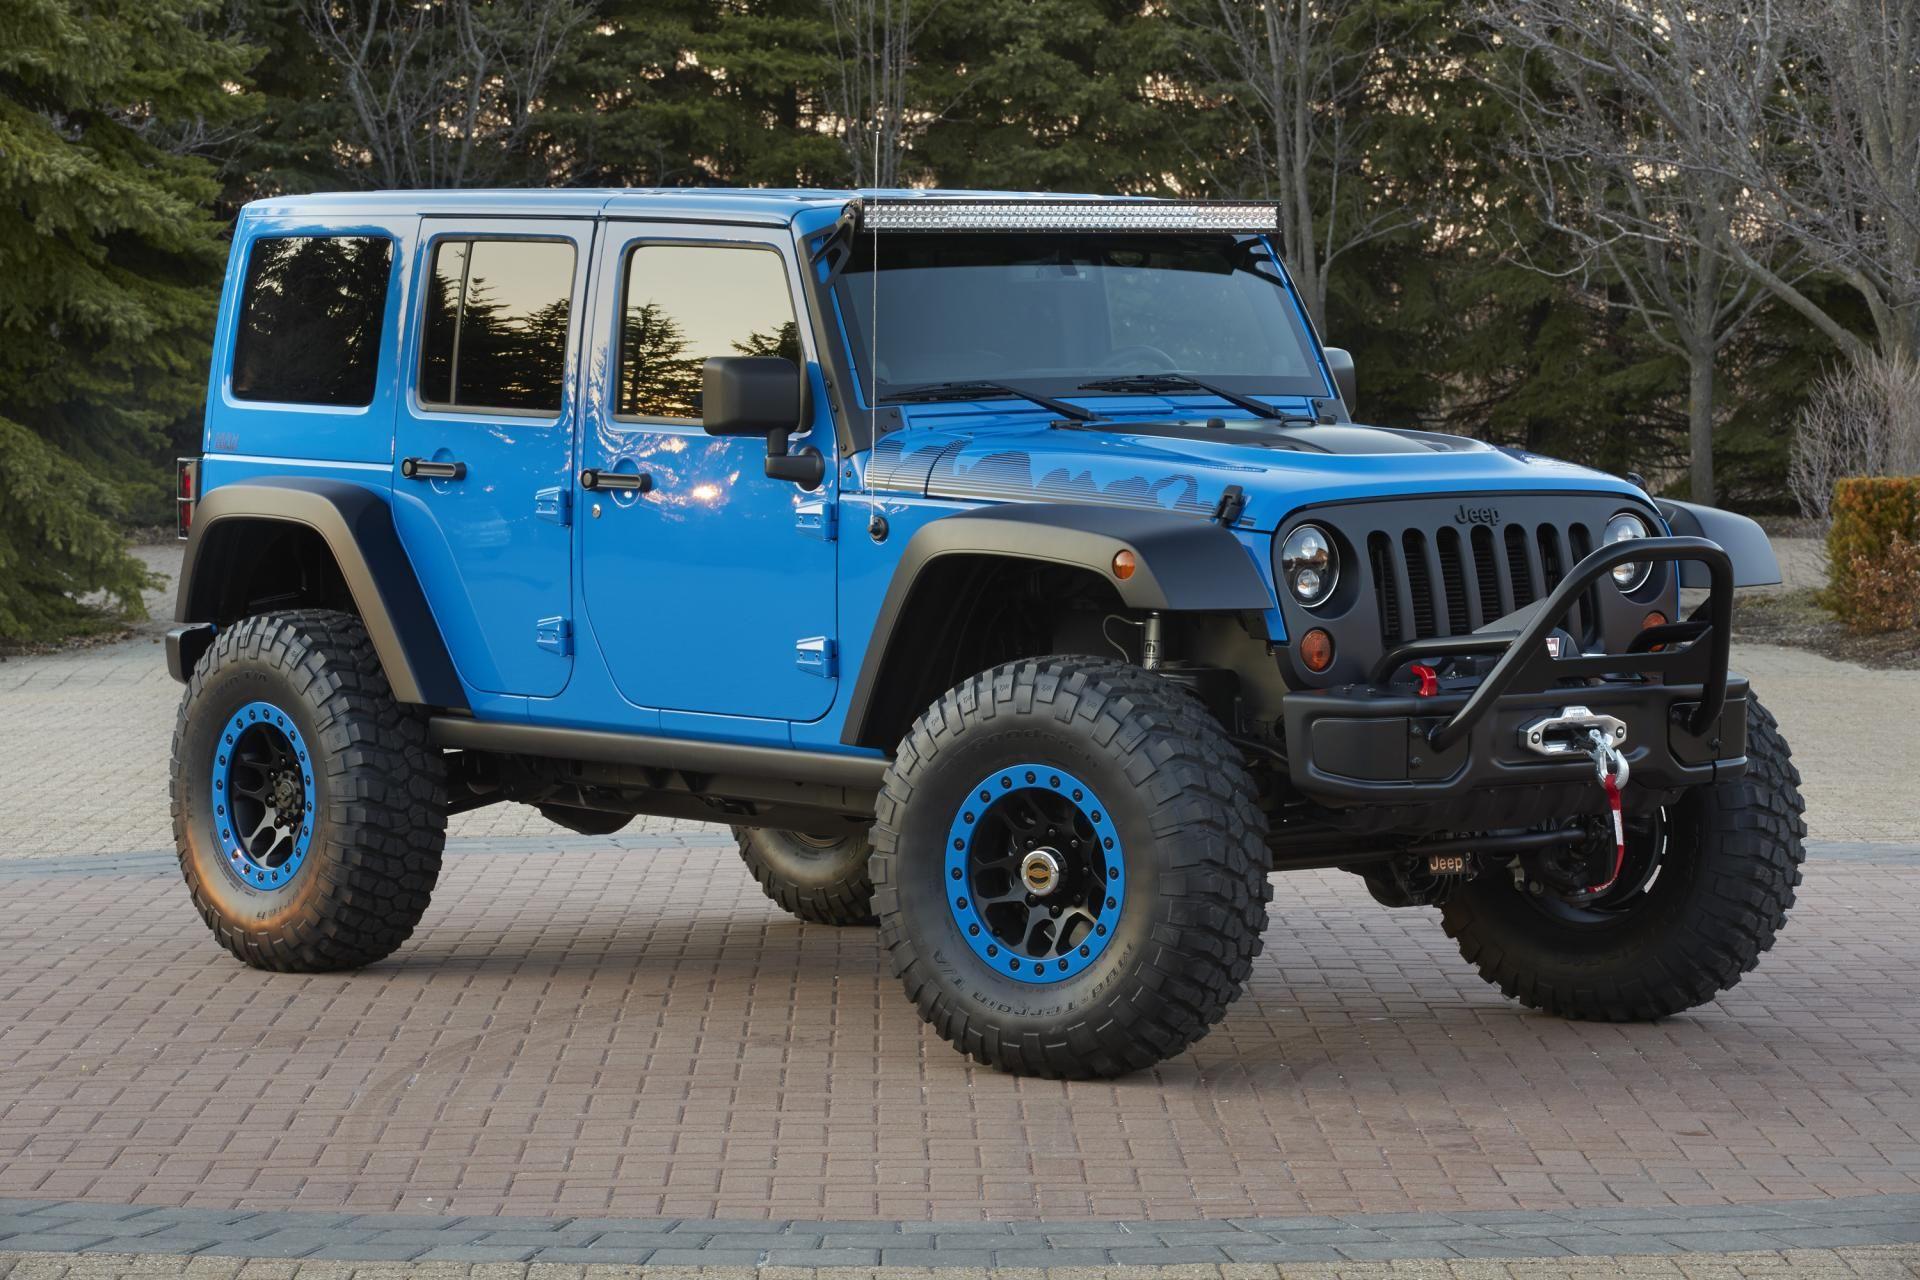 jeep rubicon jk 4 door blue Google Search Jeep concept